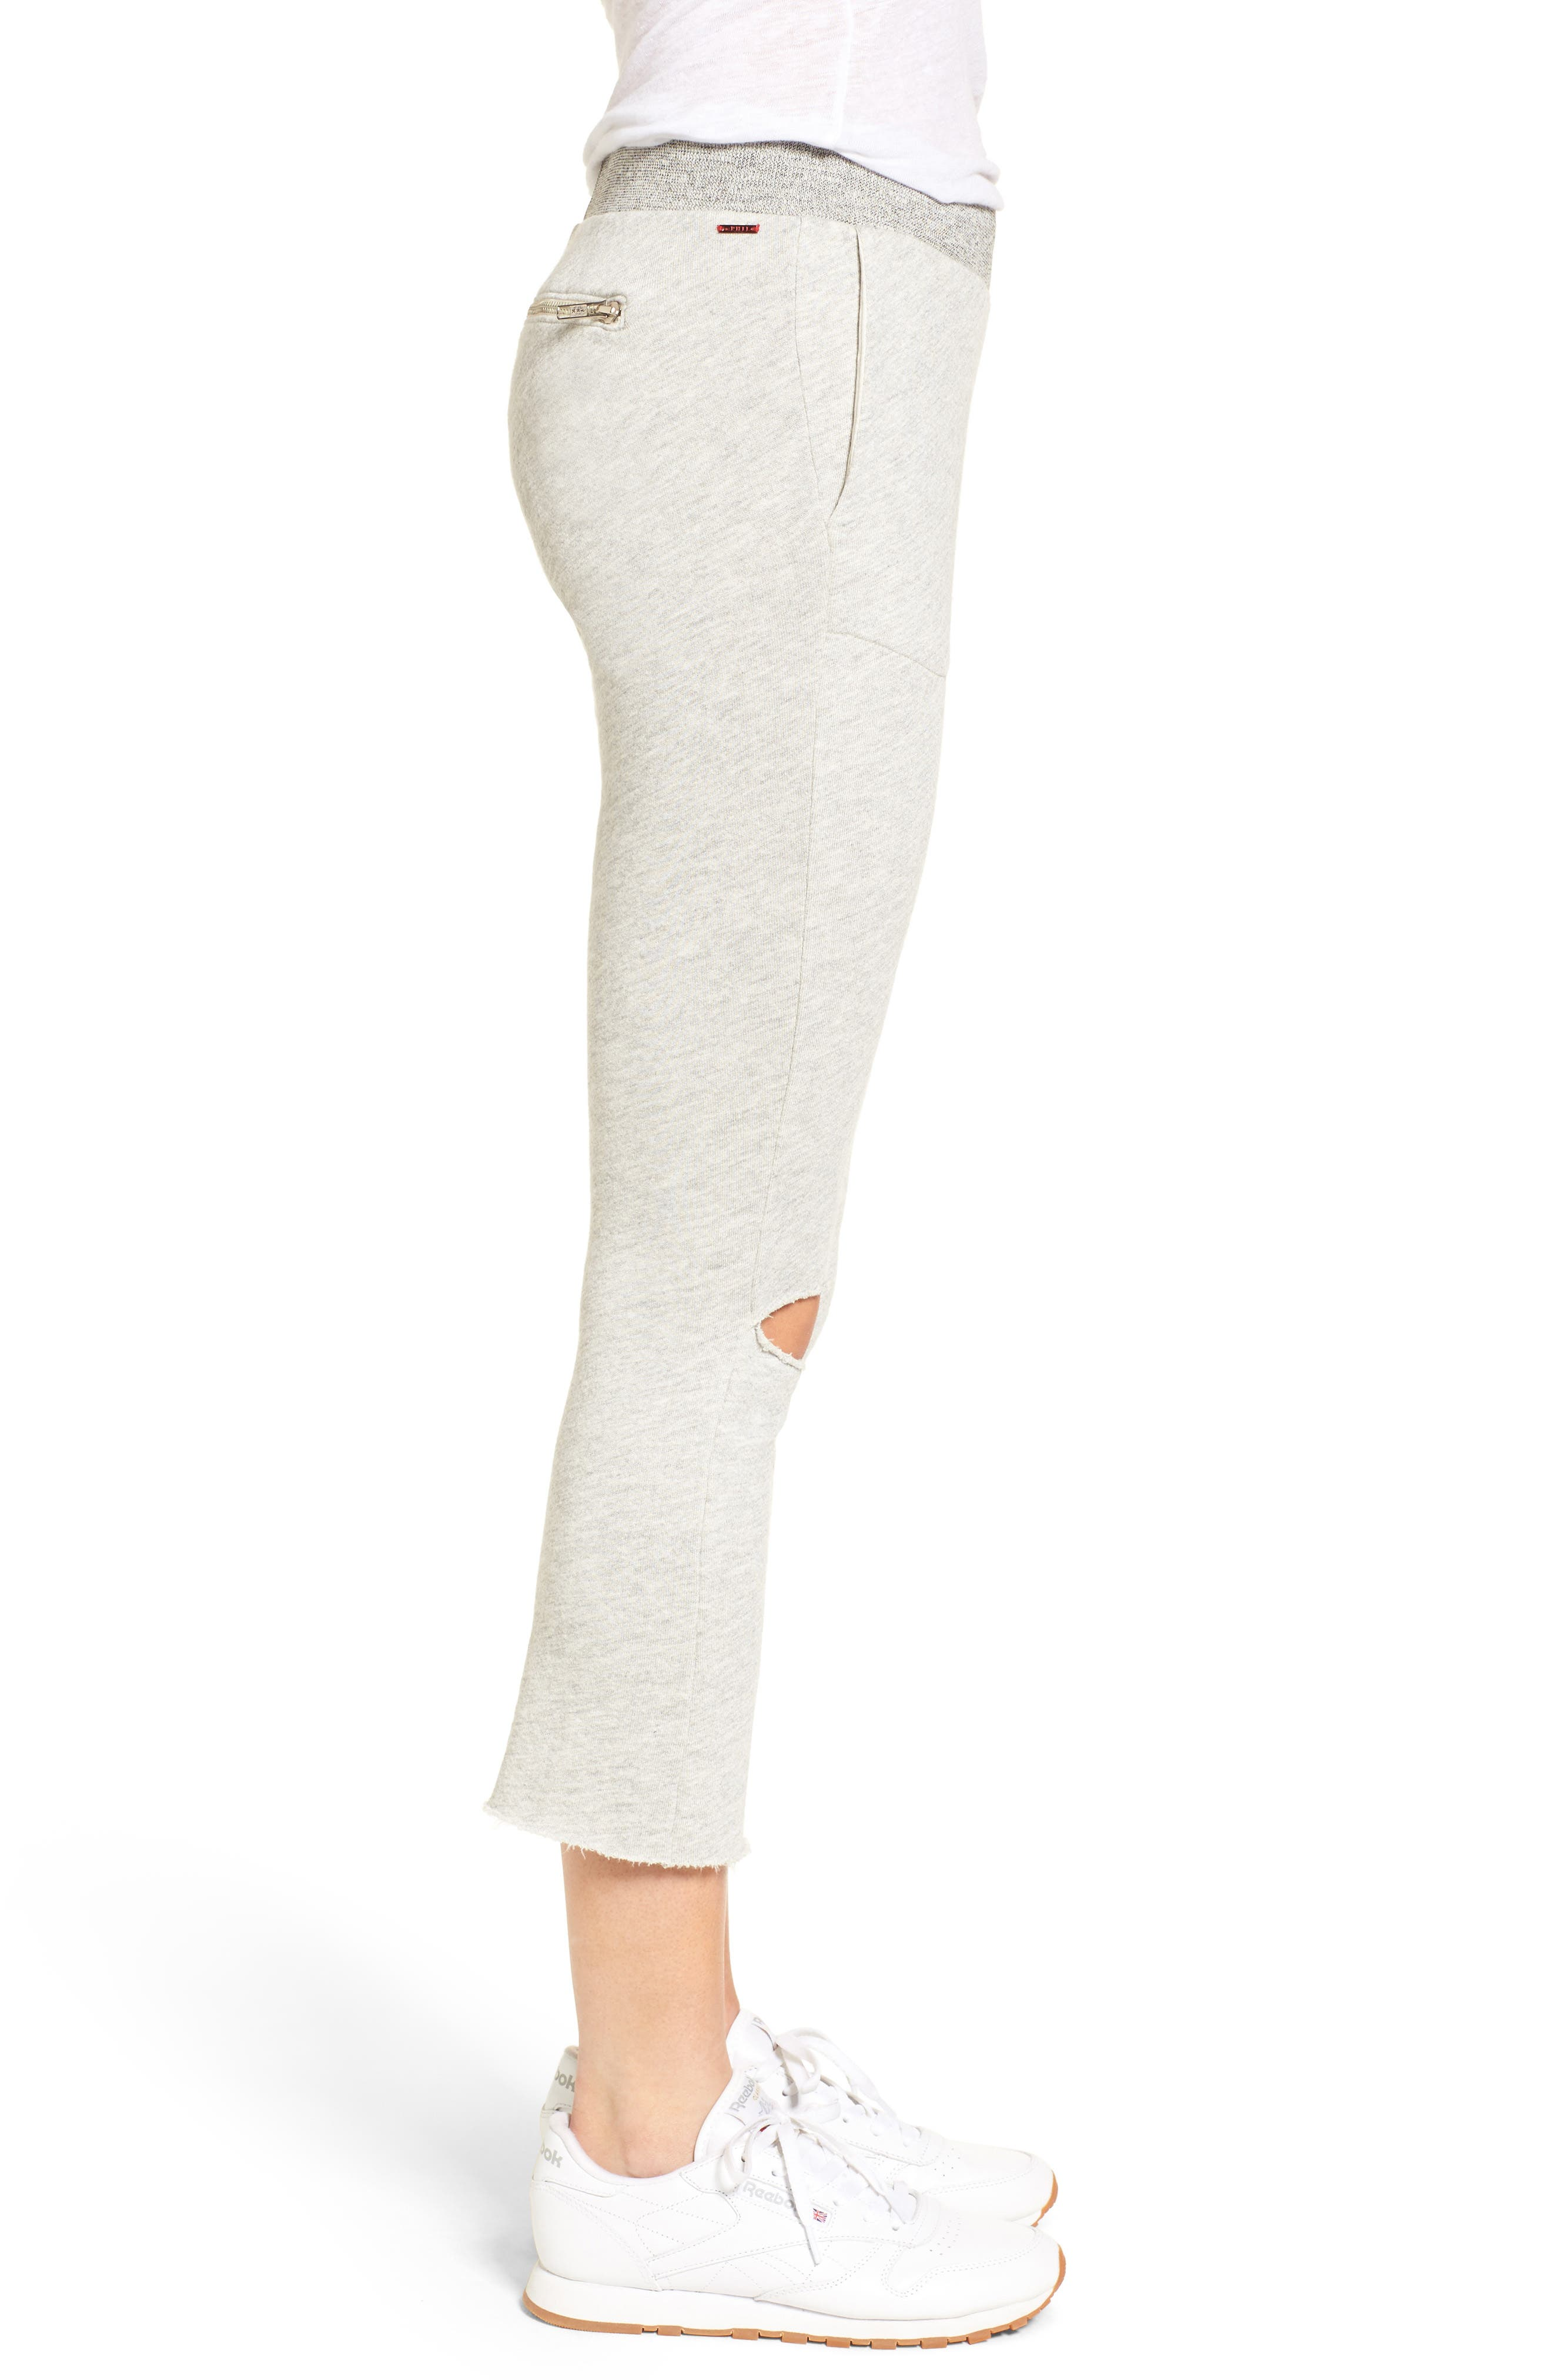 Malibu Slit Knee Sweatpants,                             Alternate thumbnail 3, color,                             030